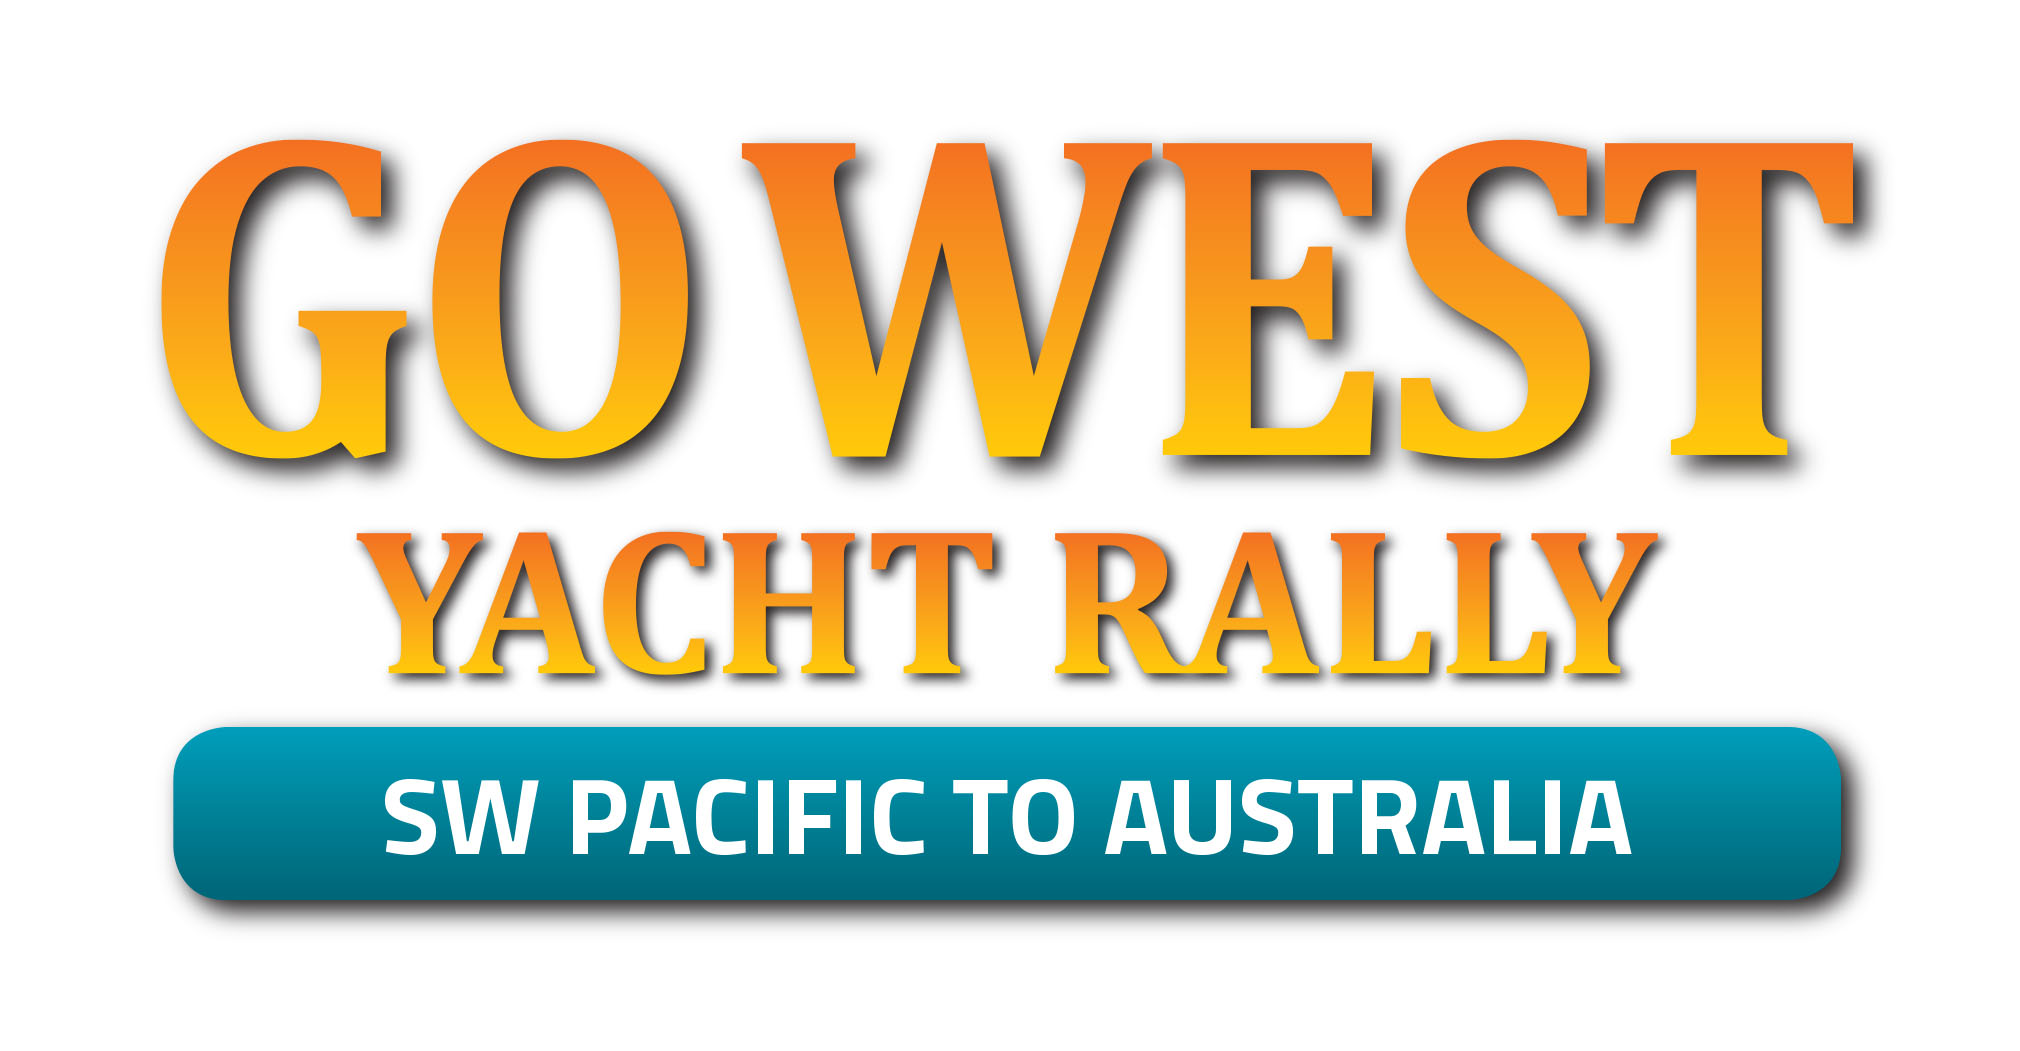 New Caledonia & Vanuatu to Australia - *Departs New Caledonia or Vanuatu Oct/NovemberThe Go West Rally is a